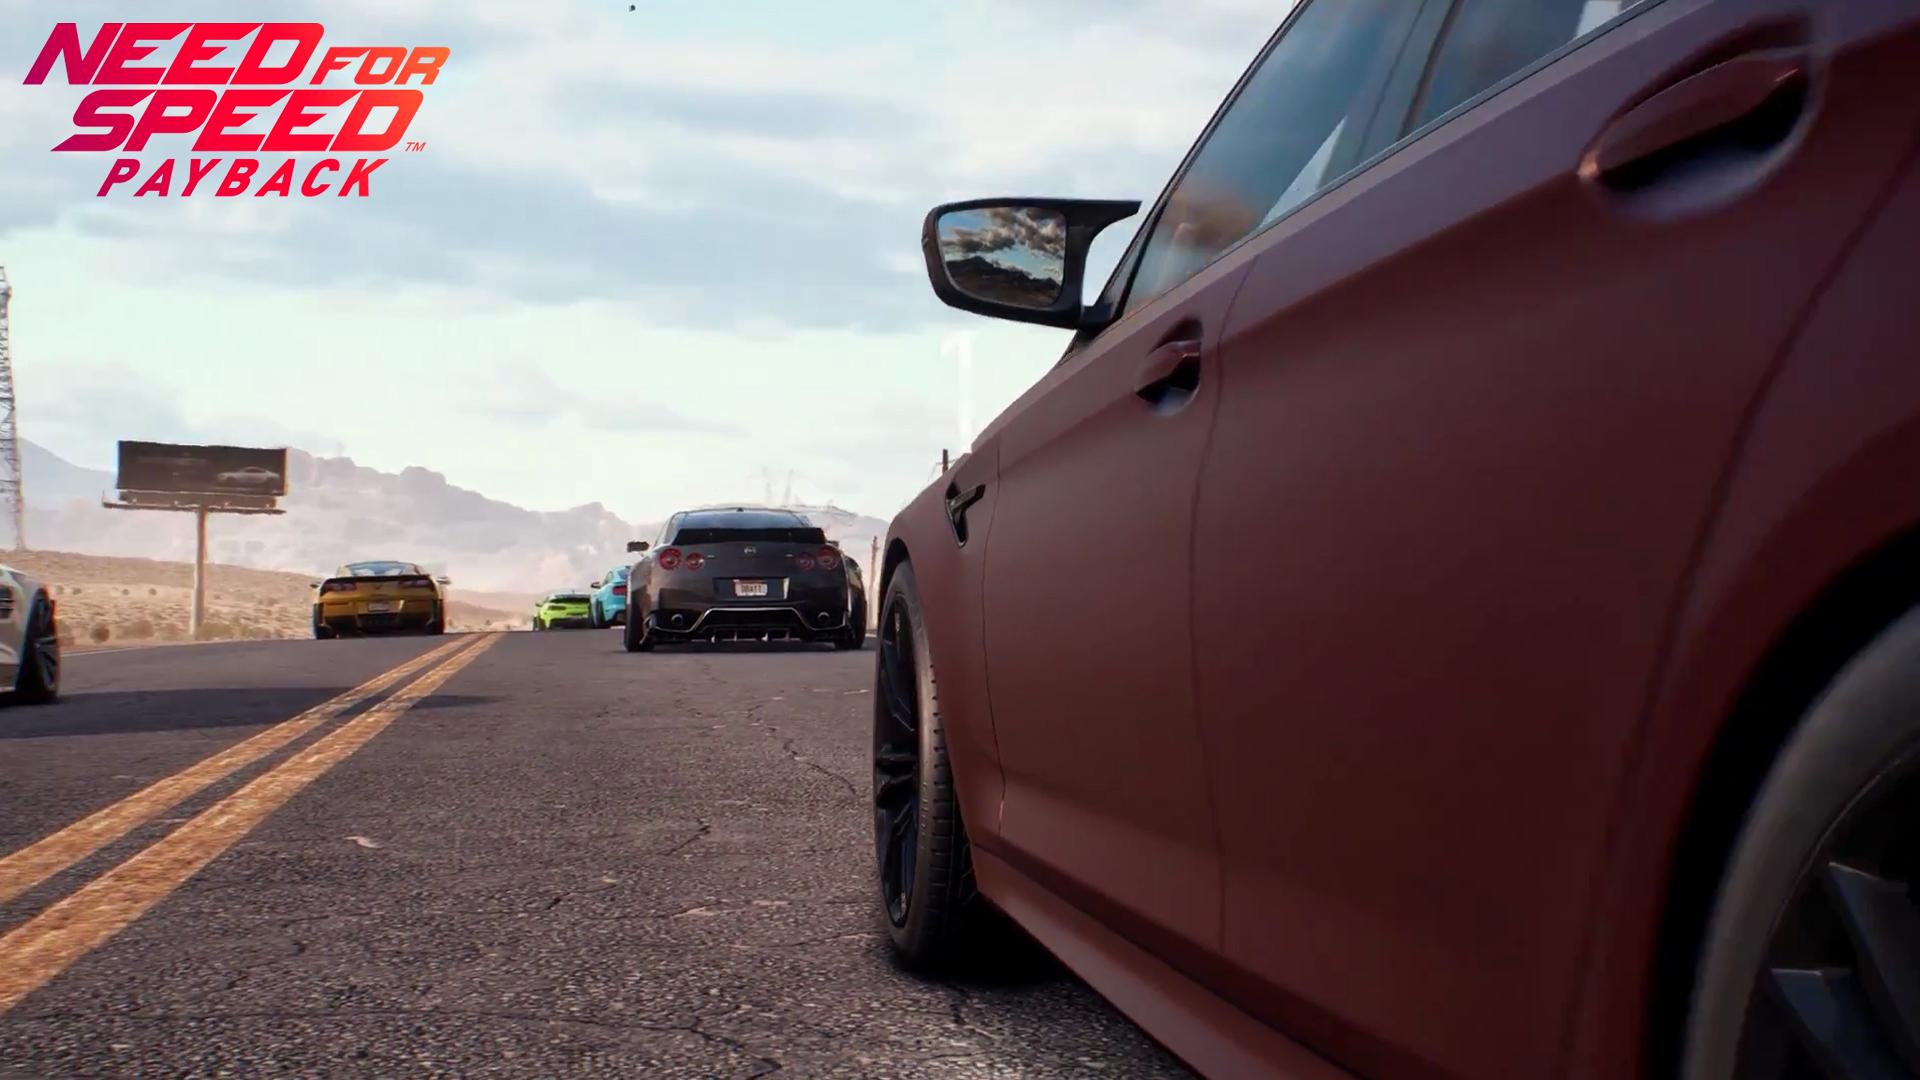 Need for Speed Payback: Автомобілі, Need For Speed, Need for Speed Payback